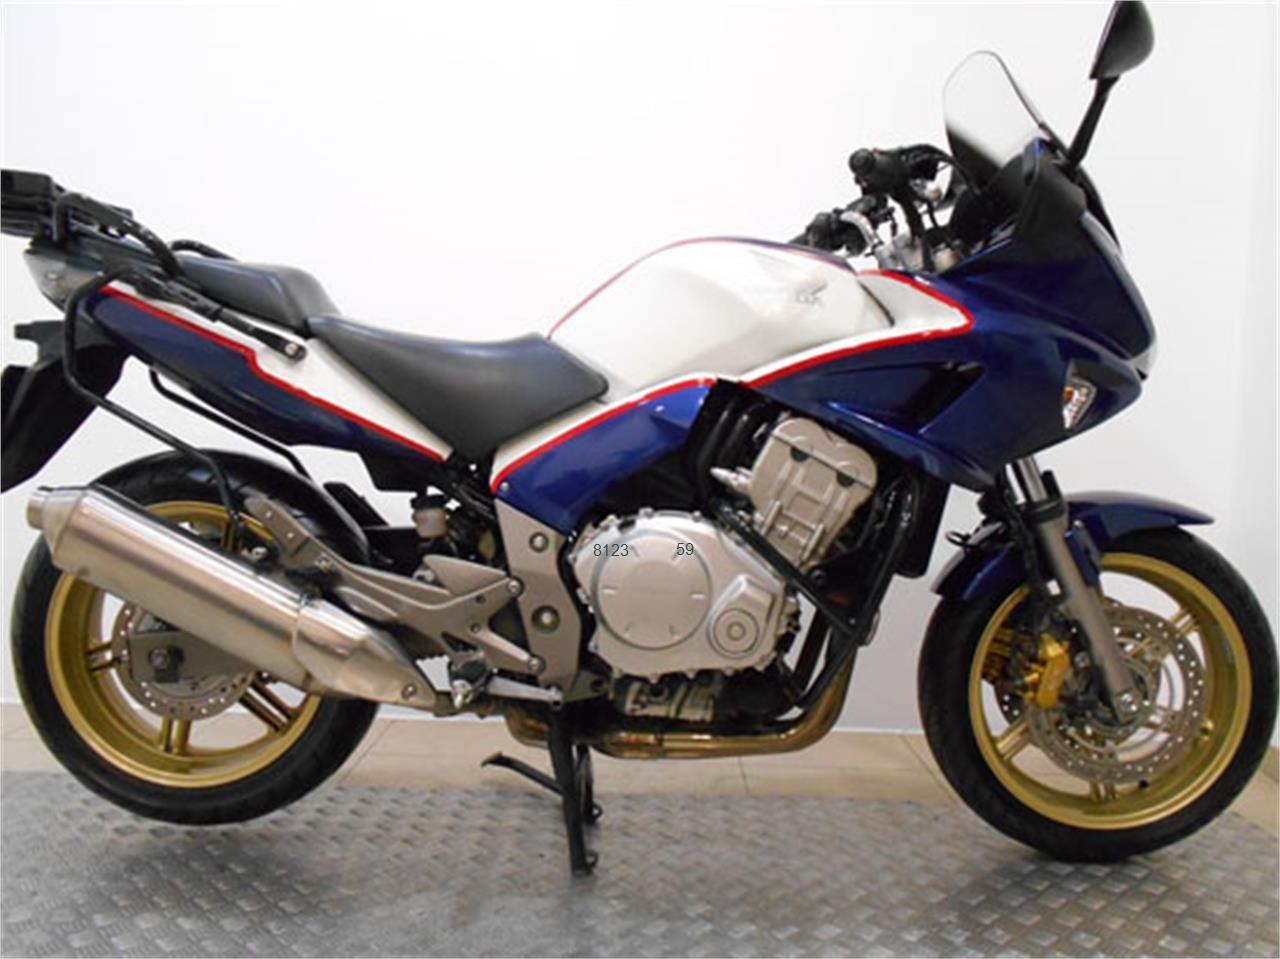 HONDA CBF 1000 C-ABS